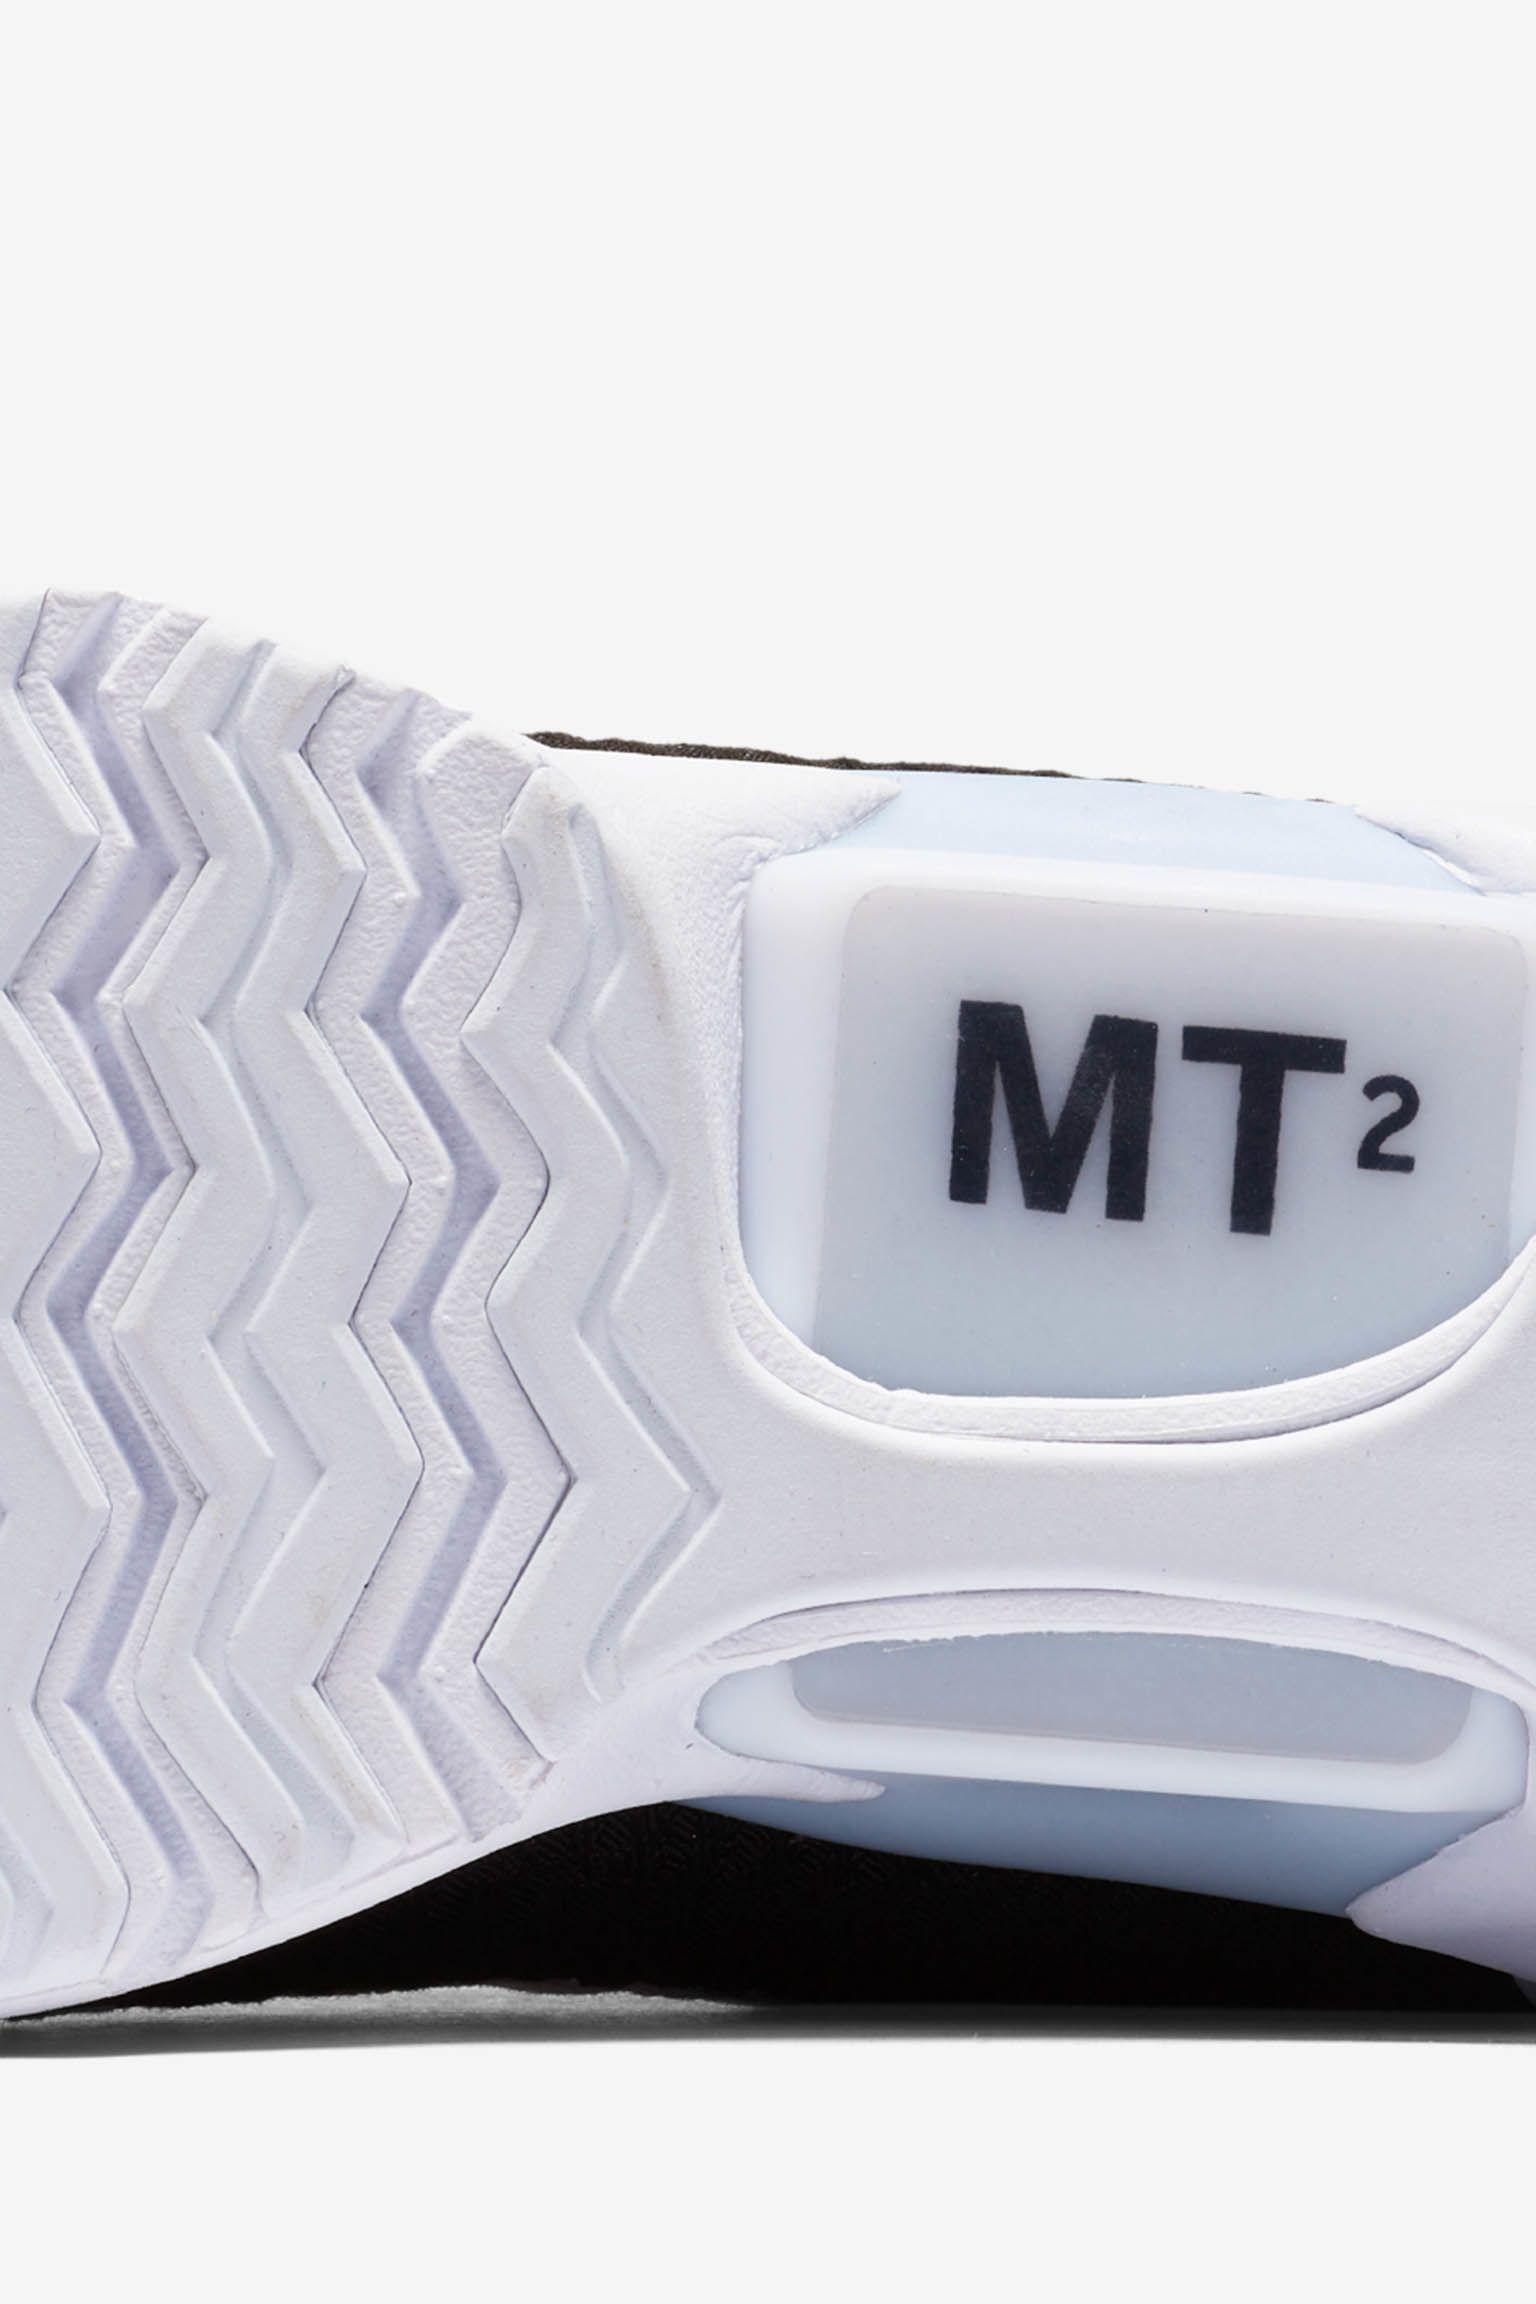 Nike HyperAdapt 1.0 'Black & White' Release Date